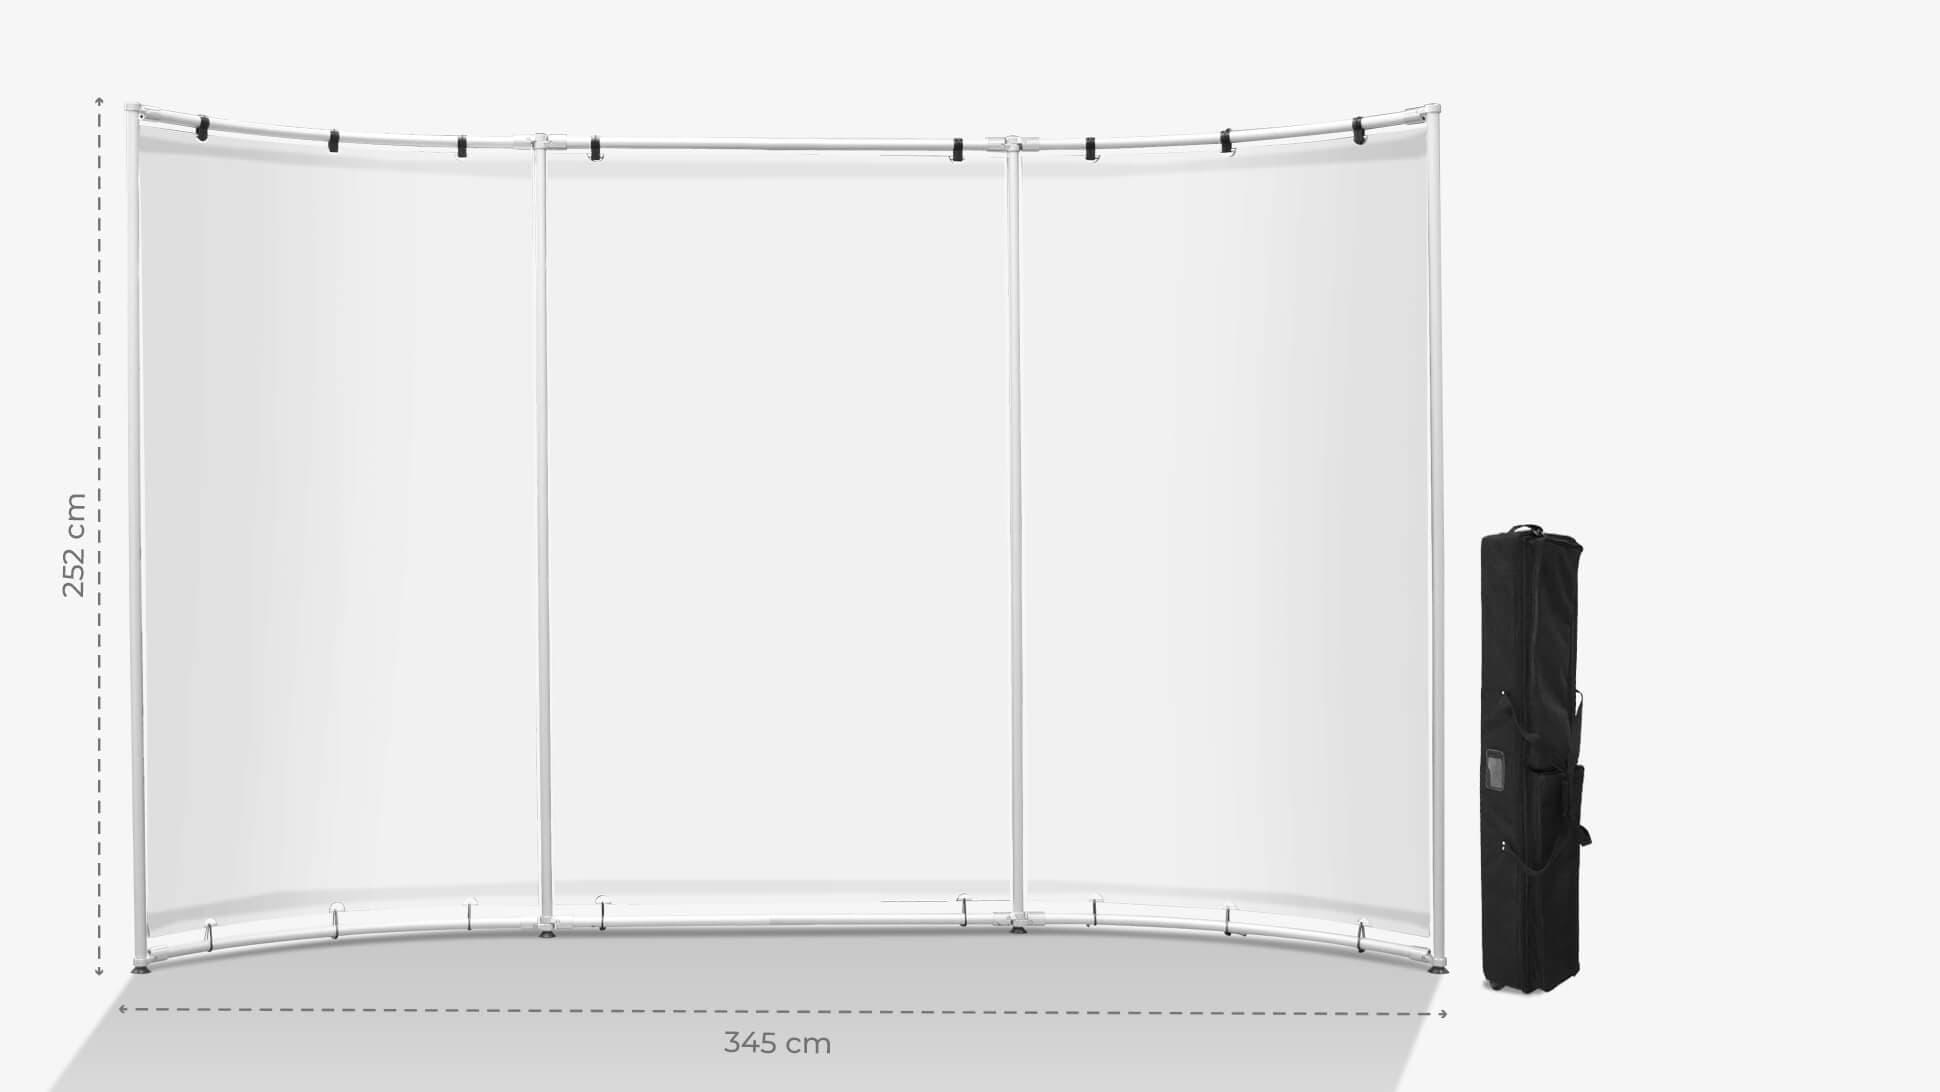 Parete espositiva 202x635 cm personalizzabile | tictac.it